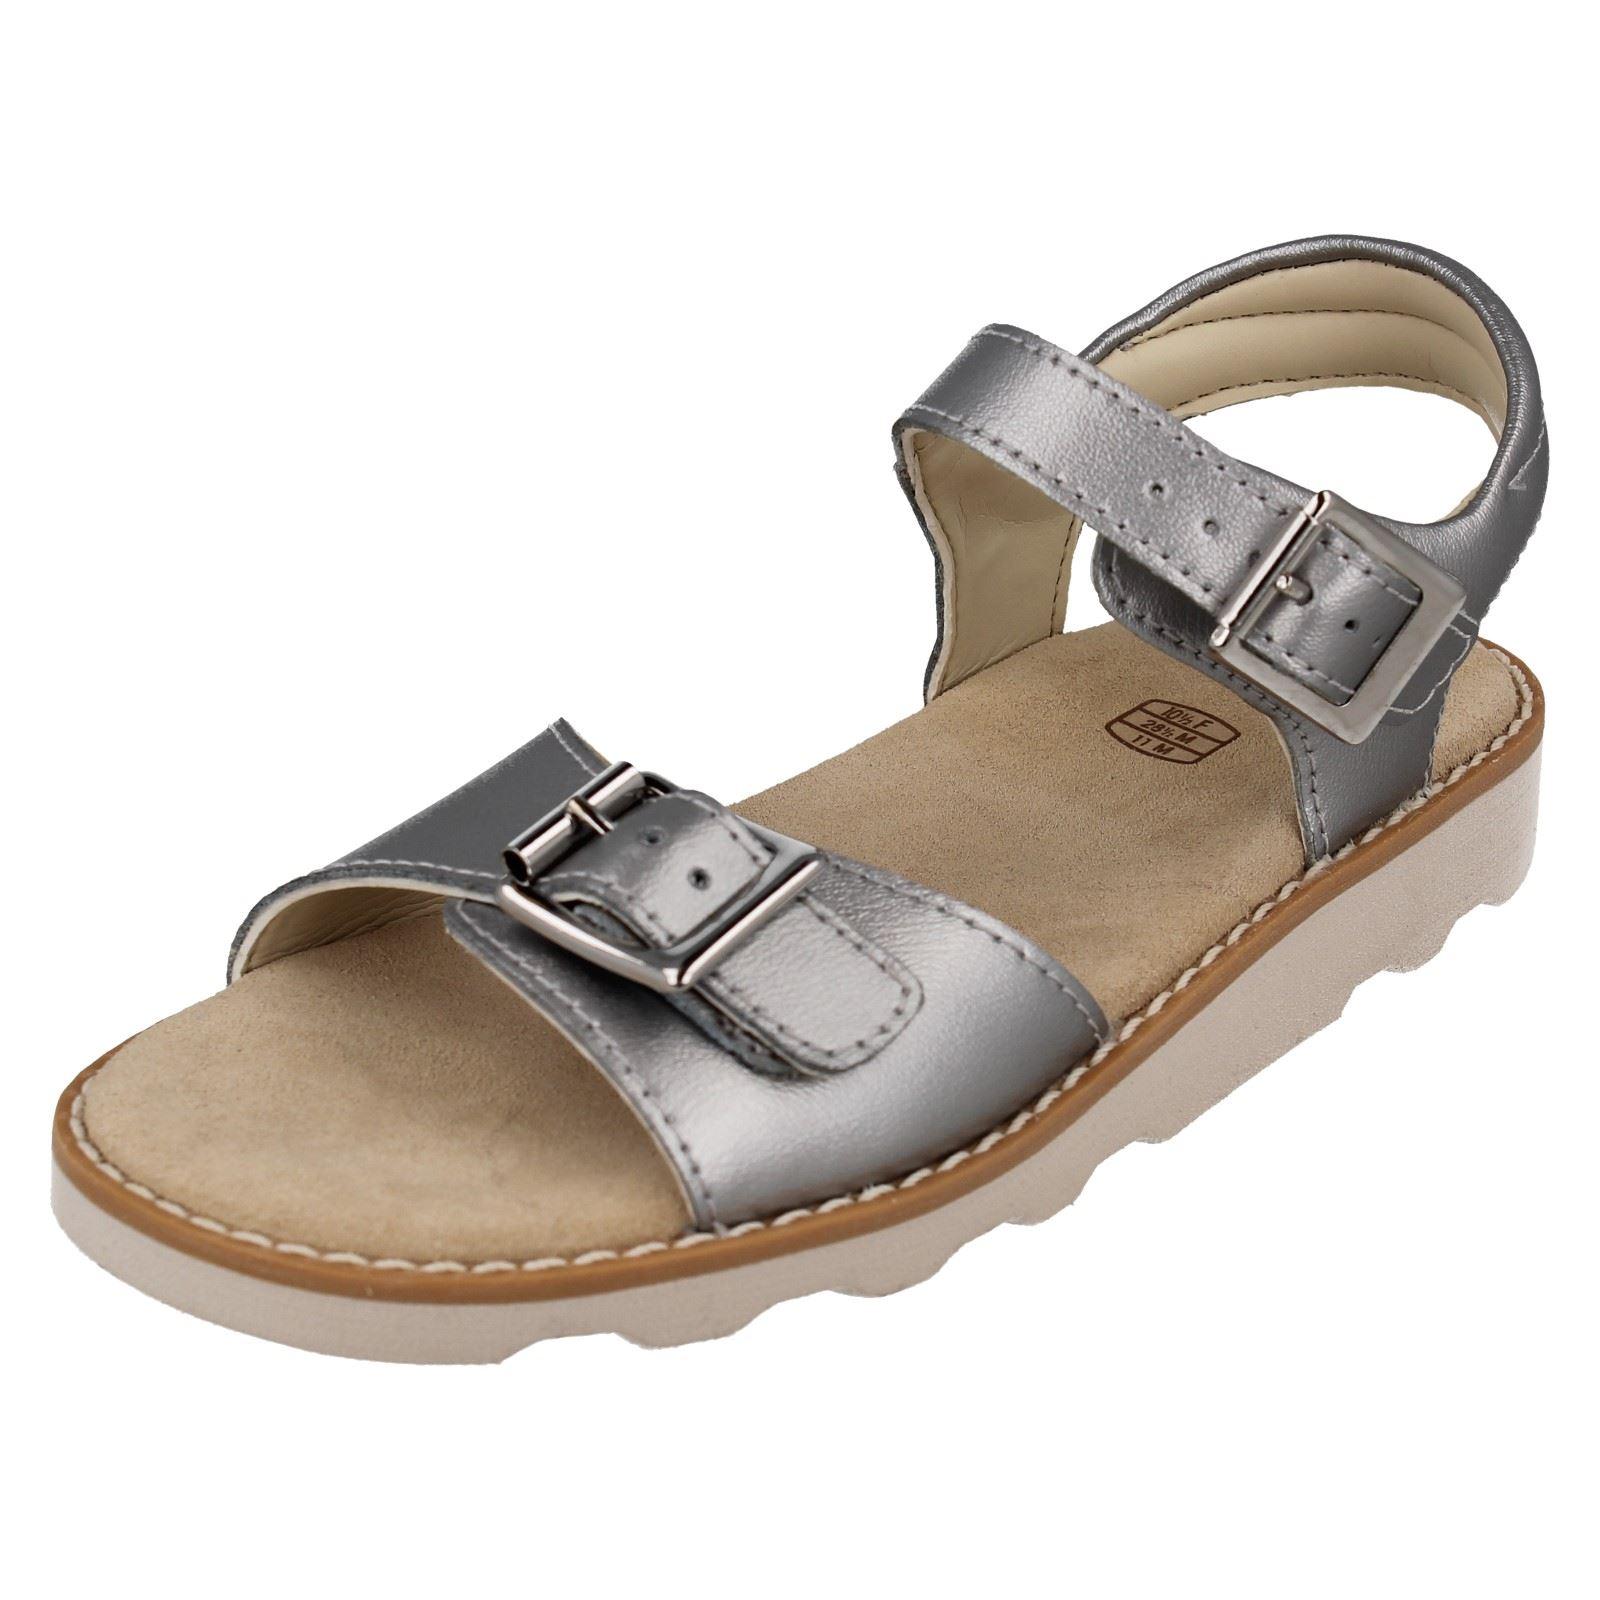 Clarks Girls Casual Summer Sandals Crown Bloom K Ebay